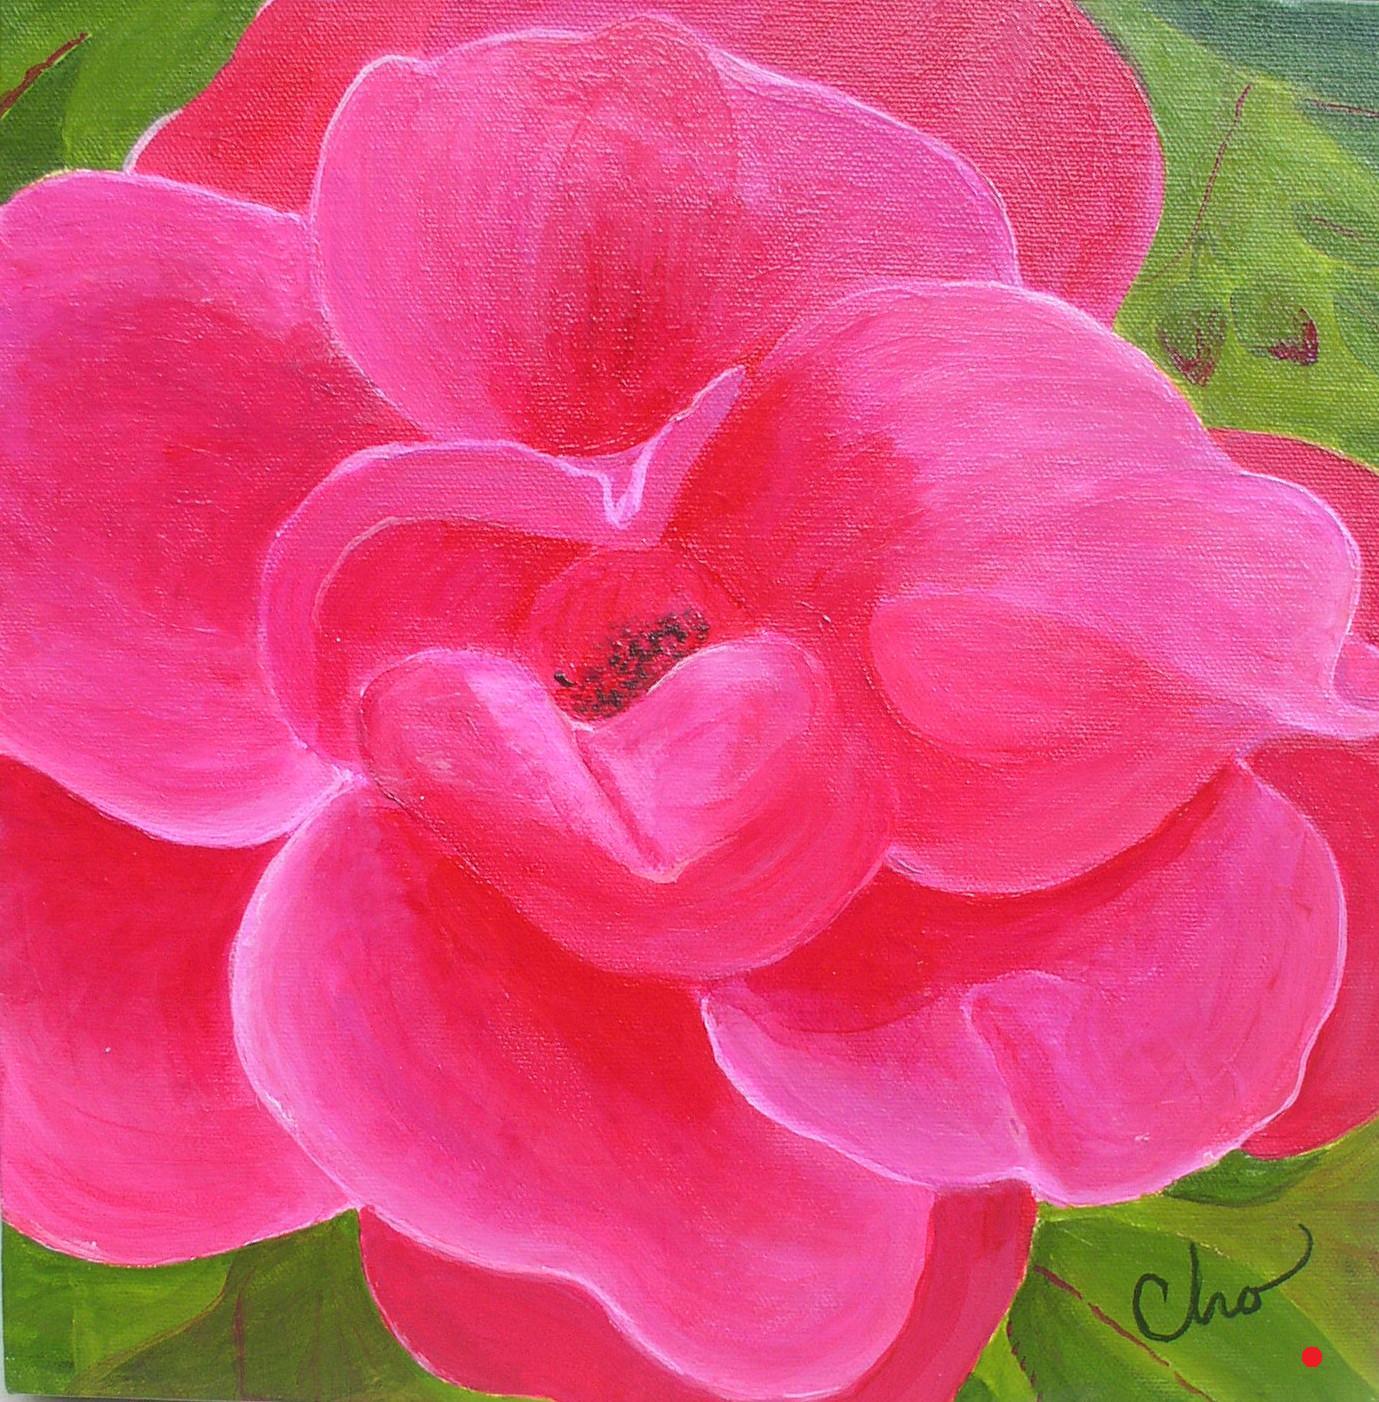 Rose 12x12 May09.jpg